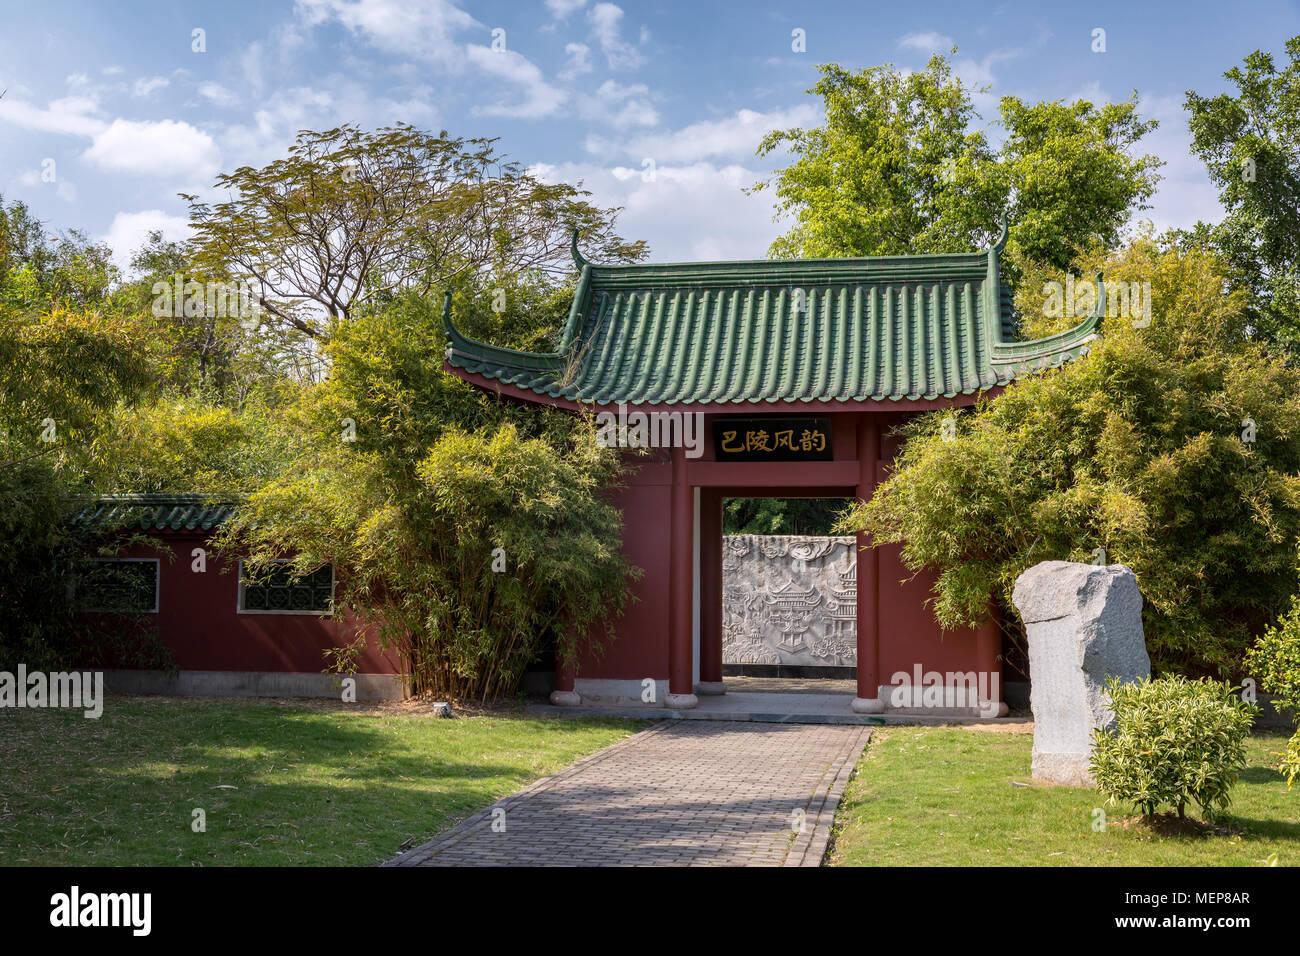 Eingang zu einem chinesischen Tempel, der Xiamen International Garden & Flower Expo Park, Jimei District, Xiamen, Fujian, China Stockfoto